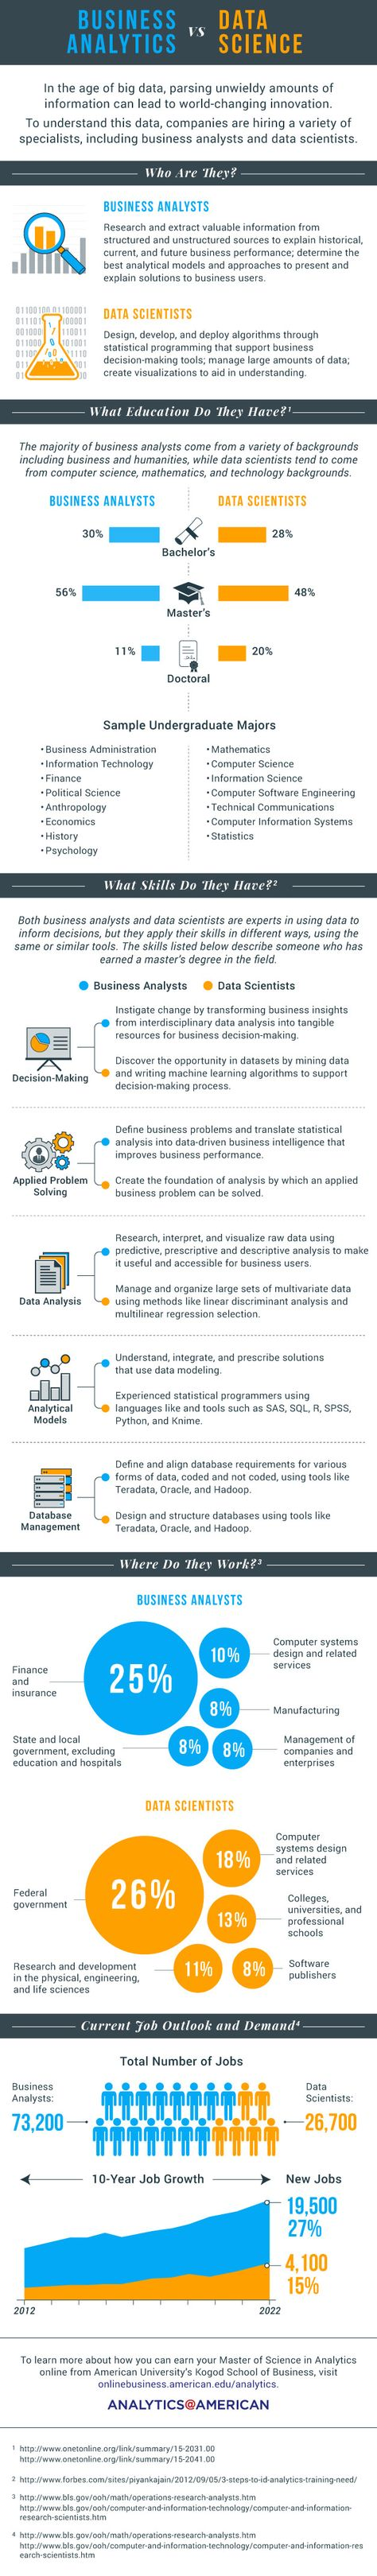 CloudTweaks | Business Analytics Vs Data Science